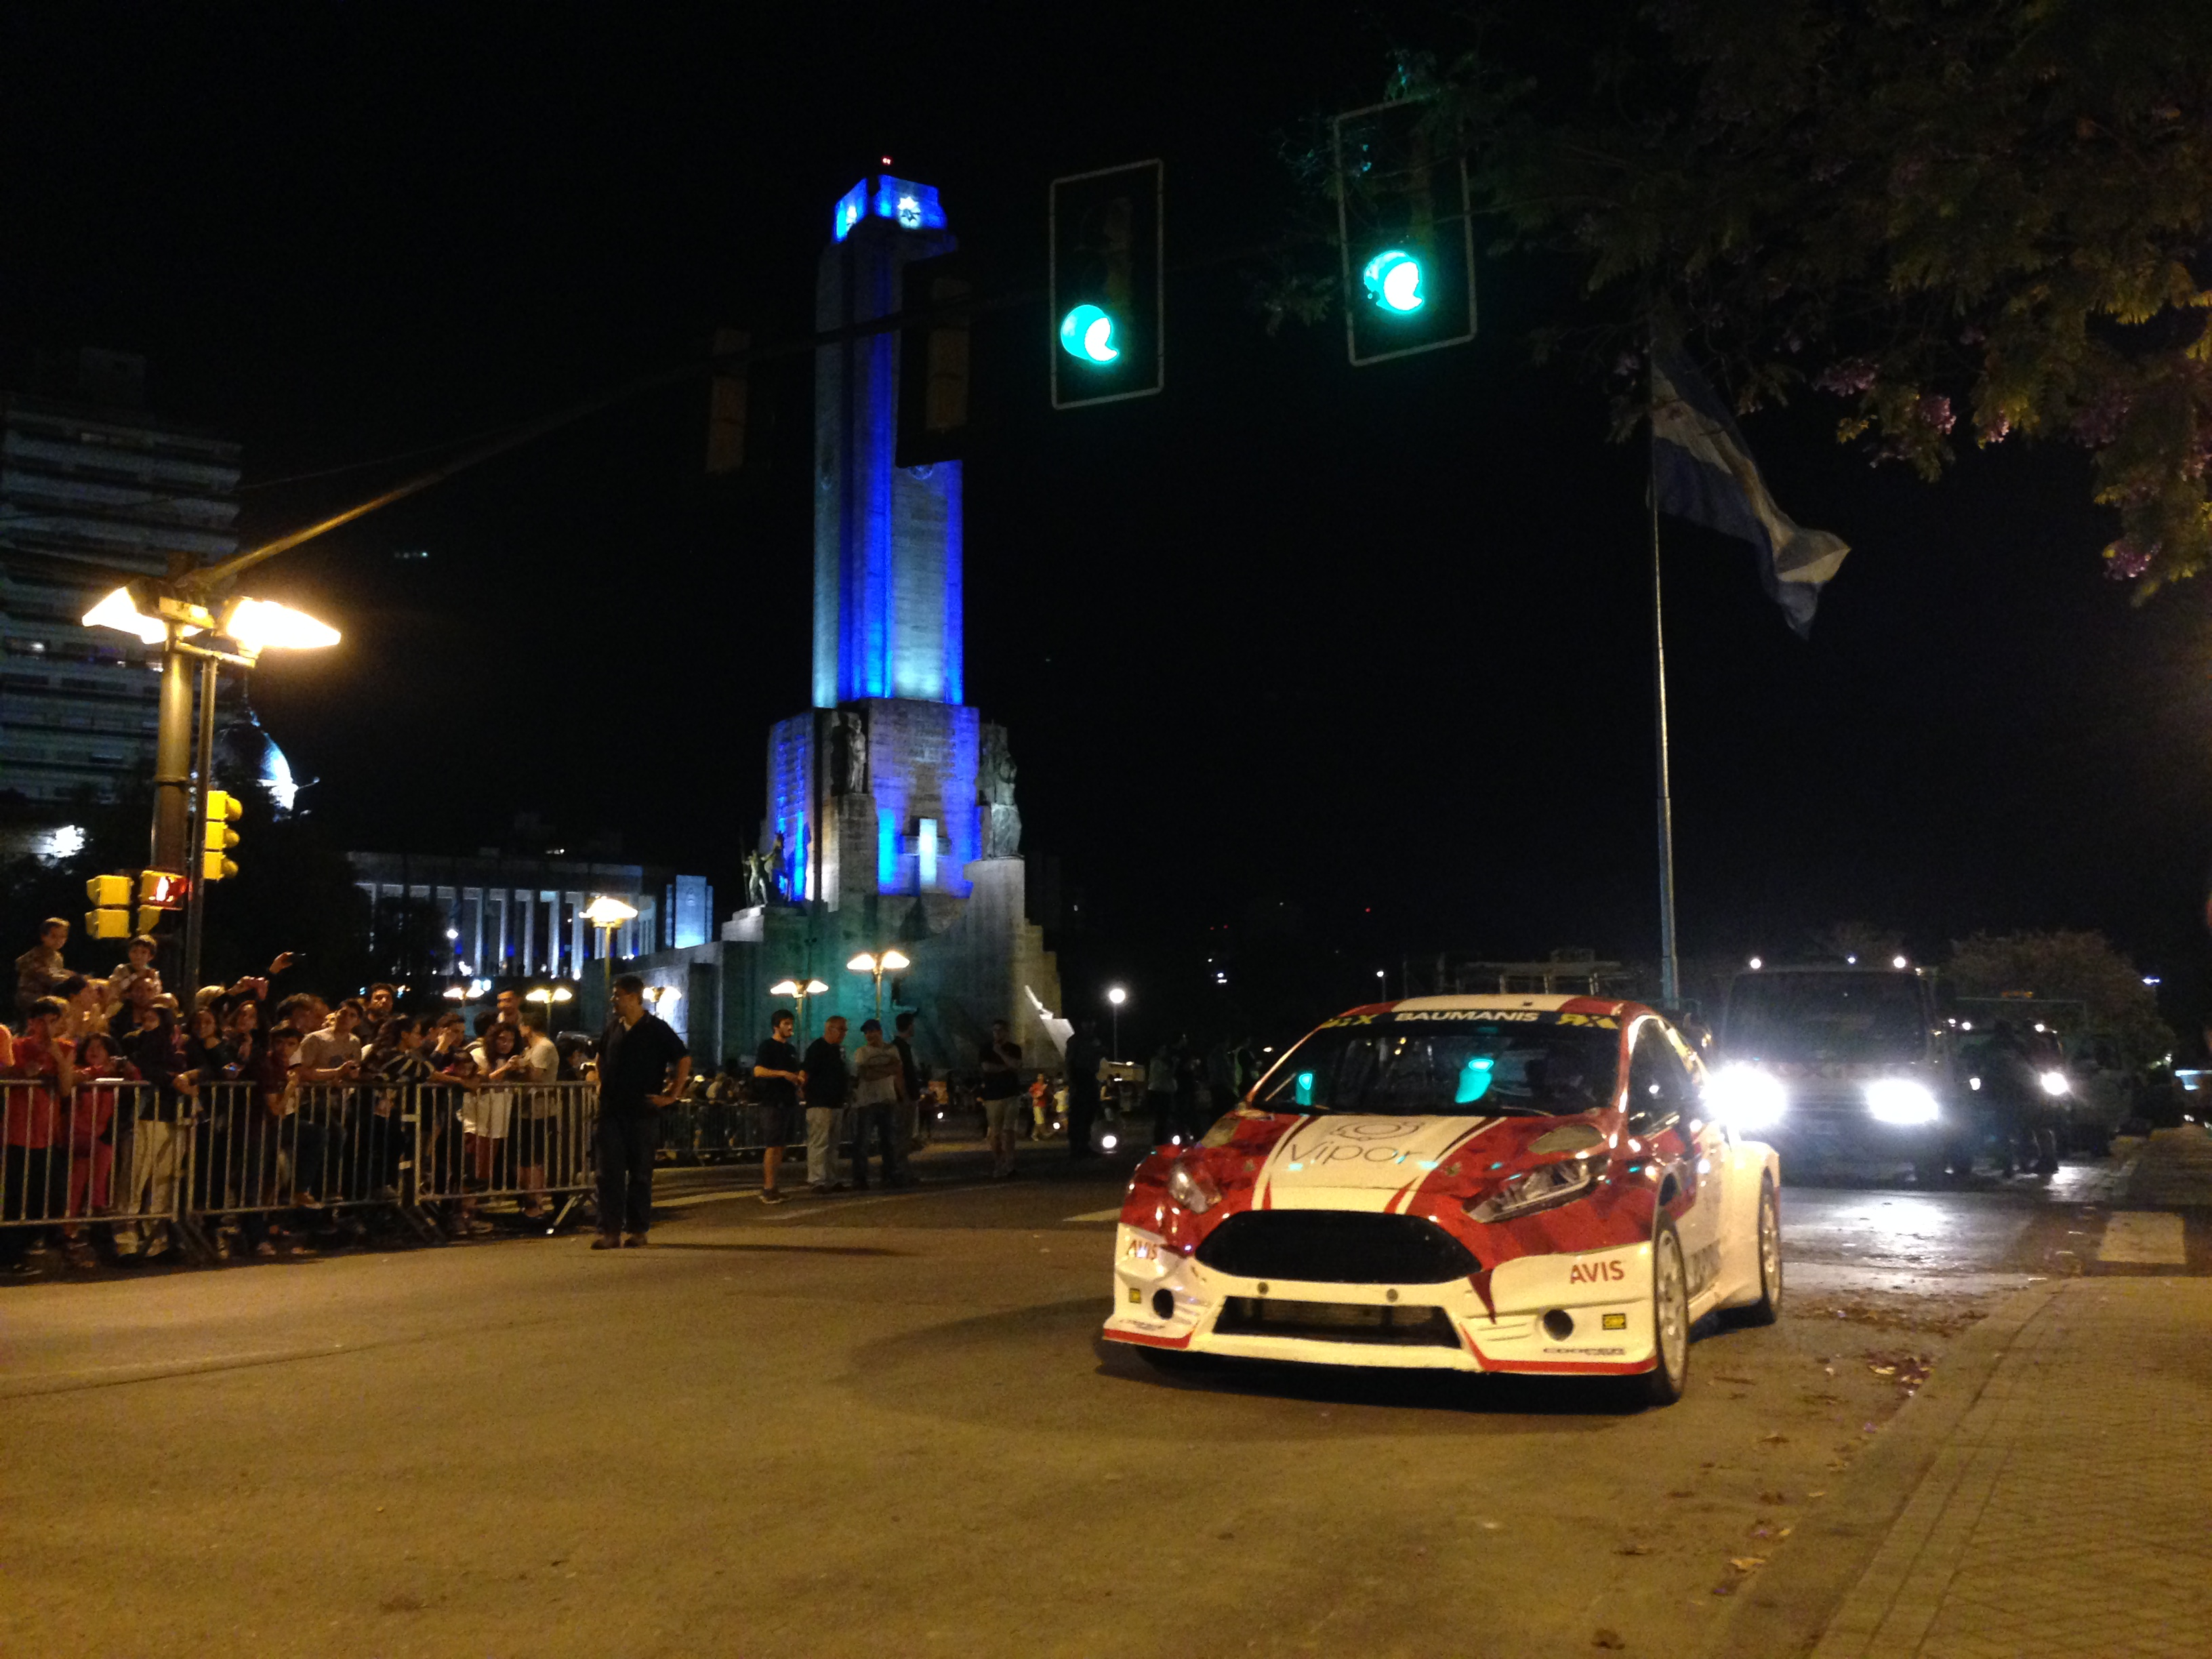 Ford Fiesta Super Car vor dem Monumento Historico